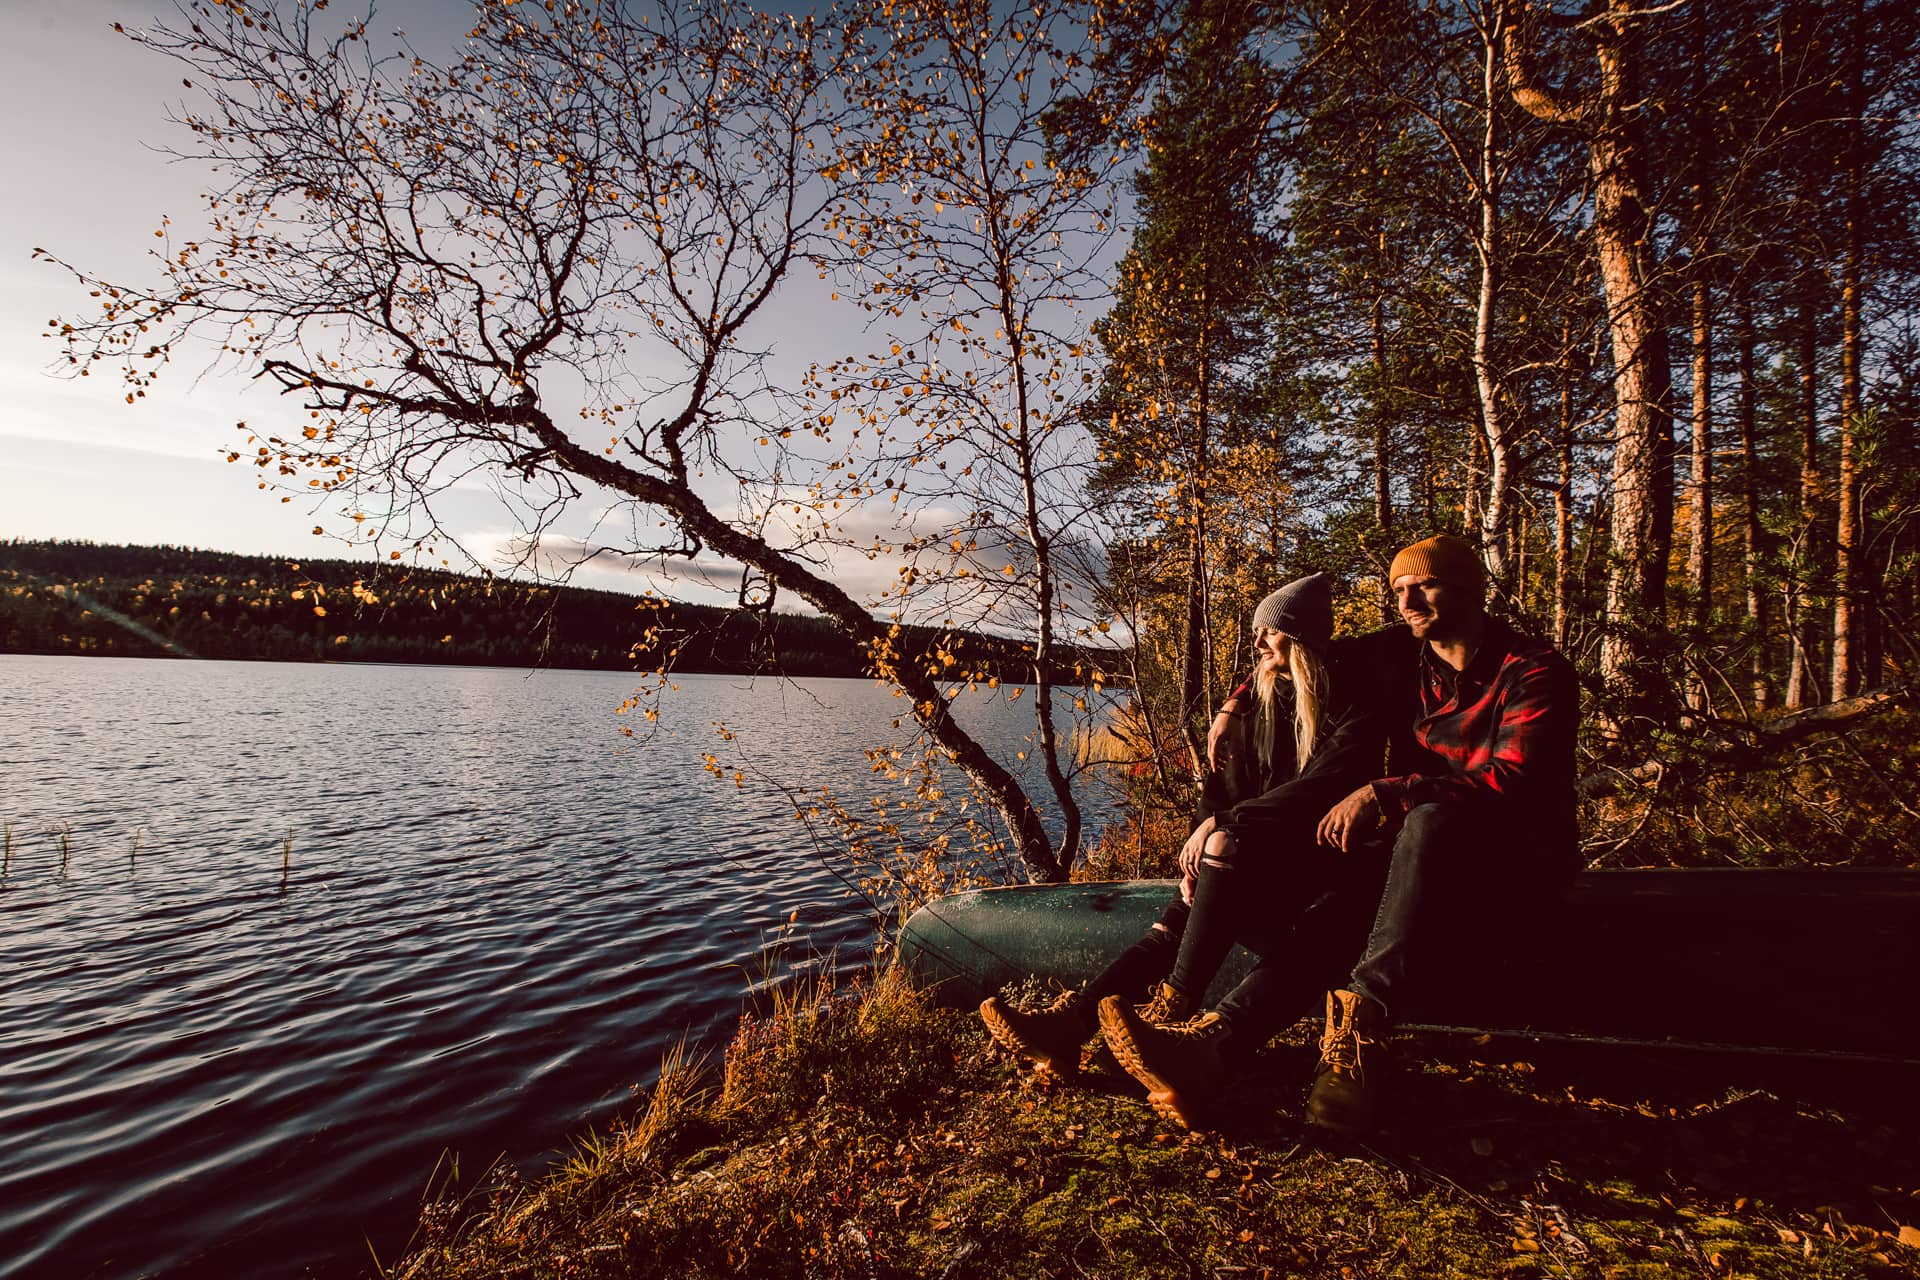 Amazing autumn vacation trip to Aurora Village Ivalo Lapland Finland.